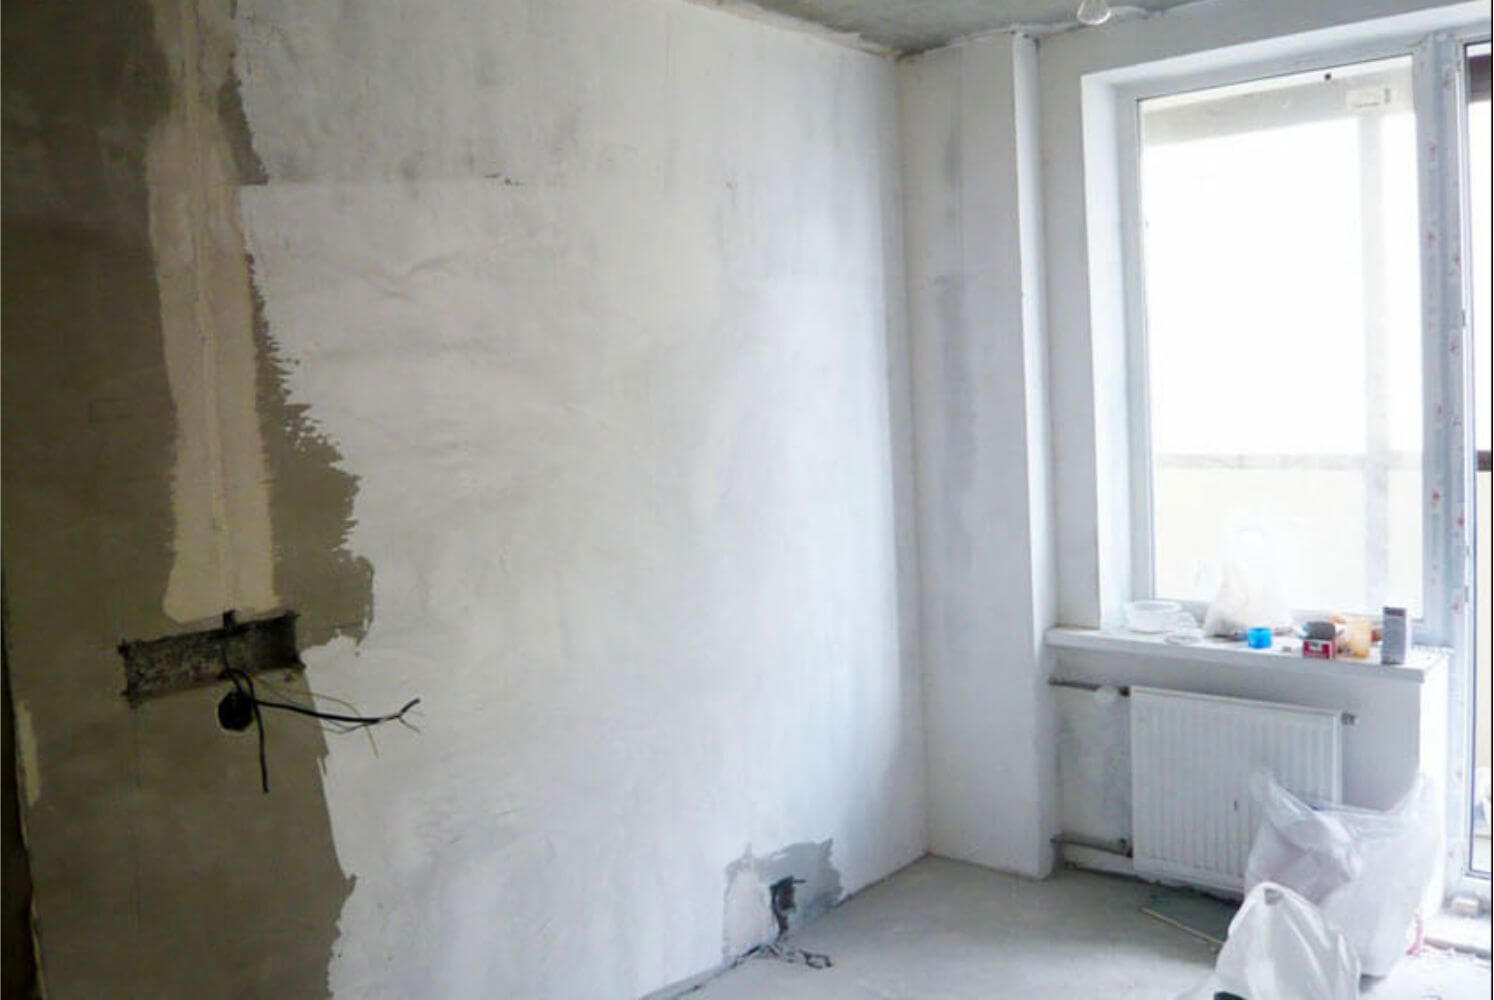 Авангард - Ремонт квартир, домов, коттеджей